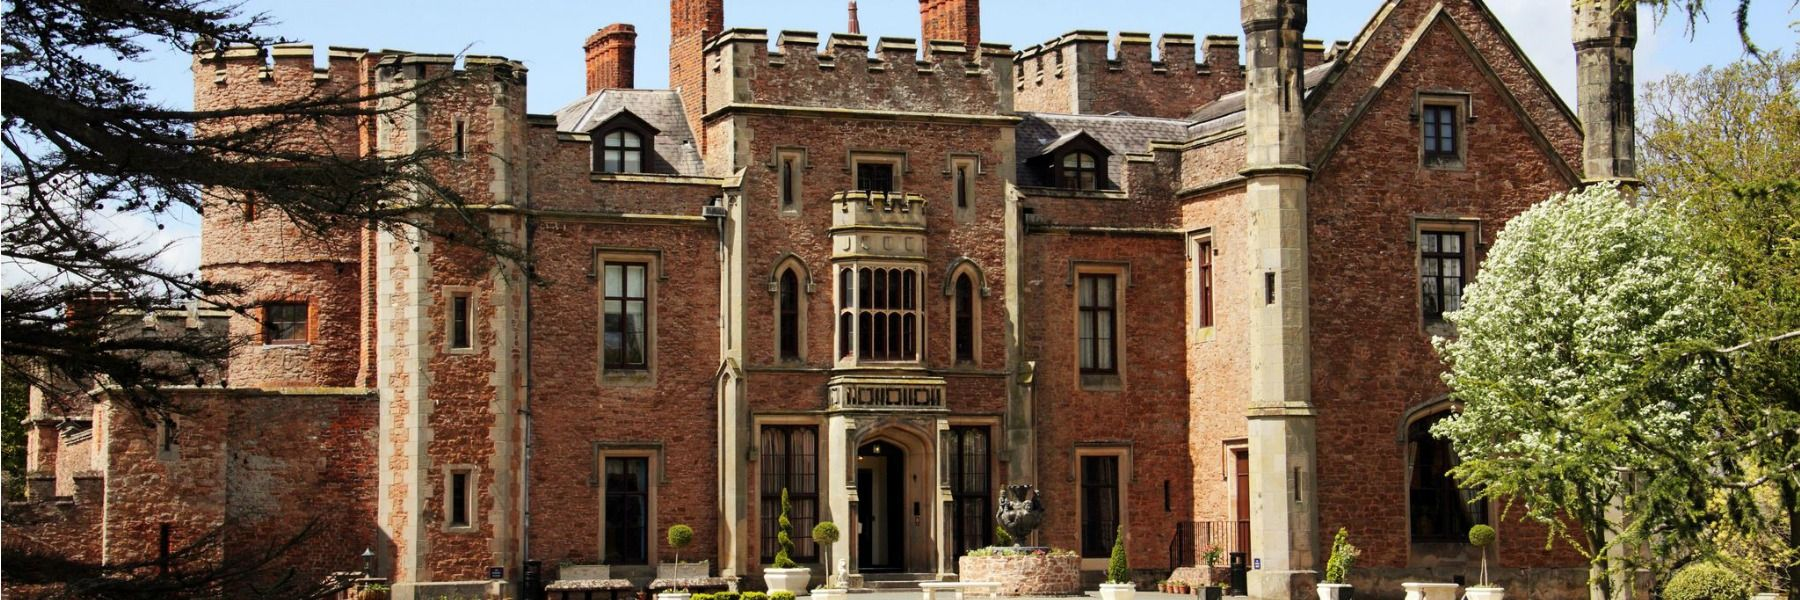 Castle Wedding Venue West Midlands